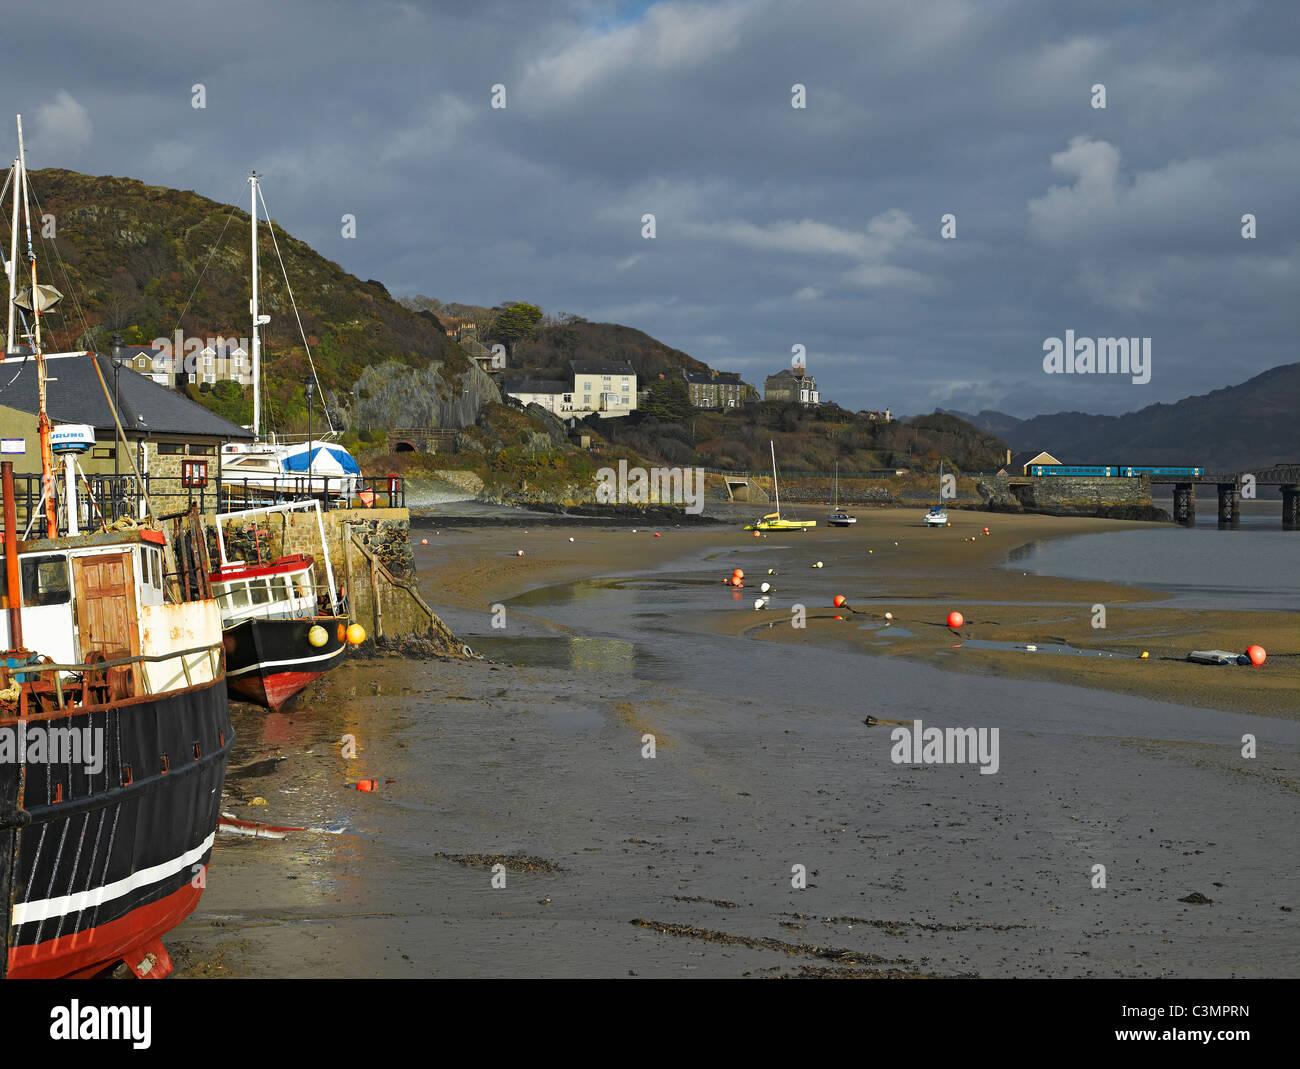 Fishing boats at low tide Barmouth Gwynedd Wales UK United Kingdom GB Great Britain Stock Photo